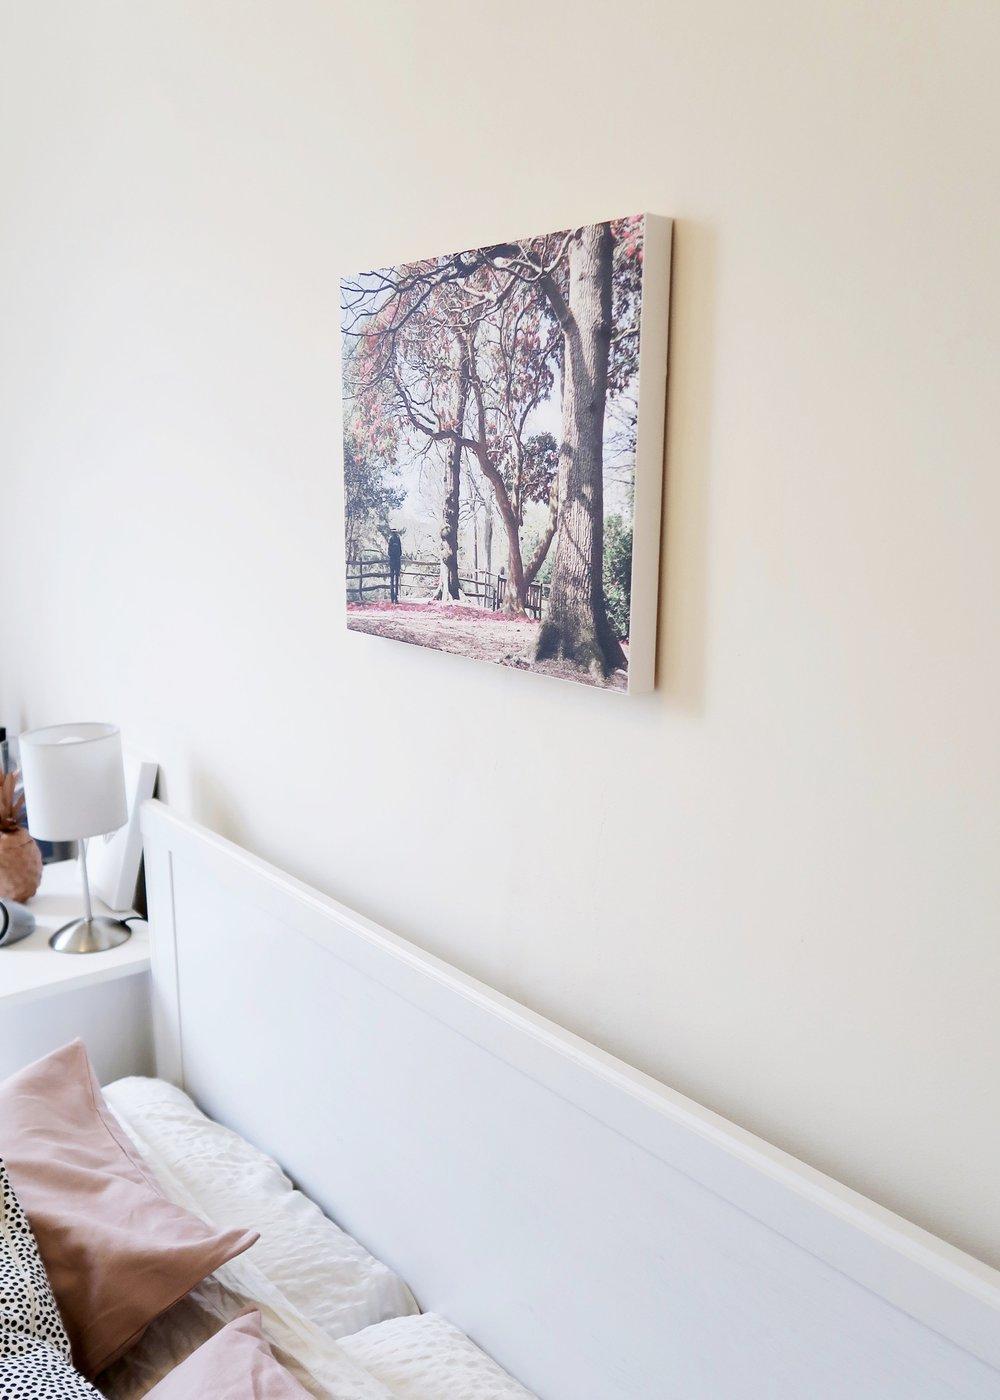 DIY Custom Canvas Print with Photowall by Isoscella